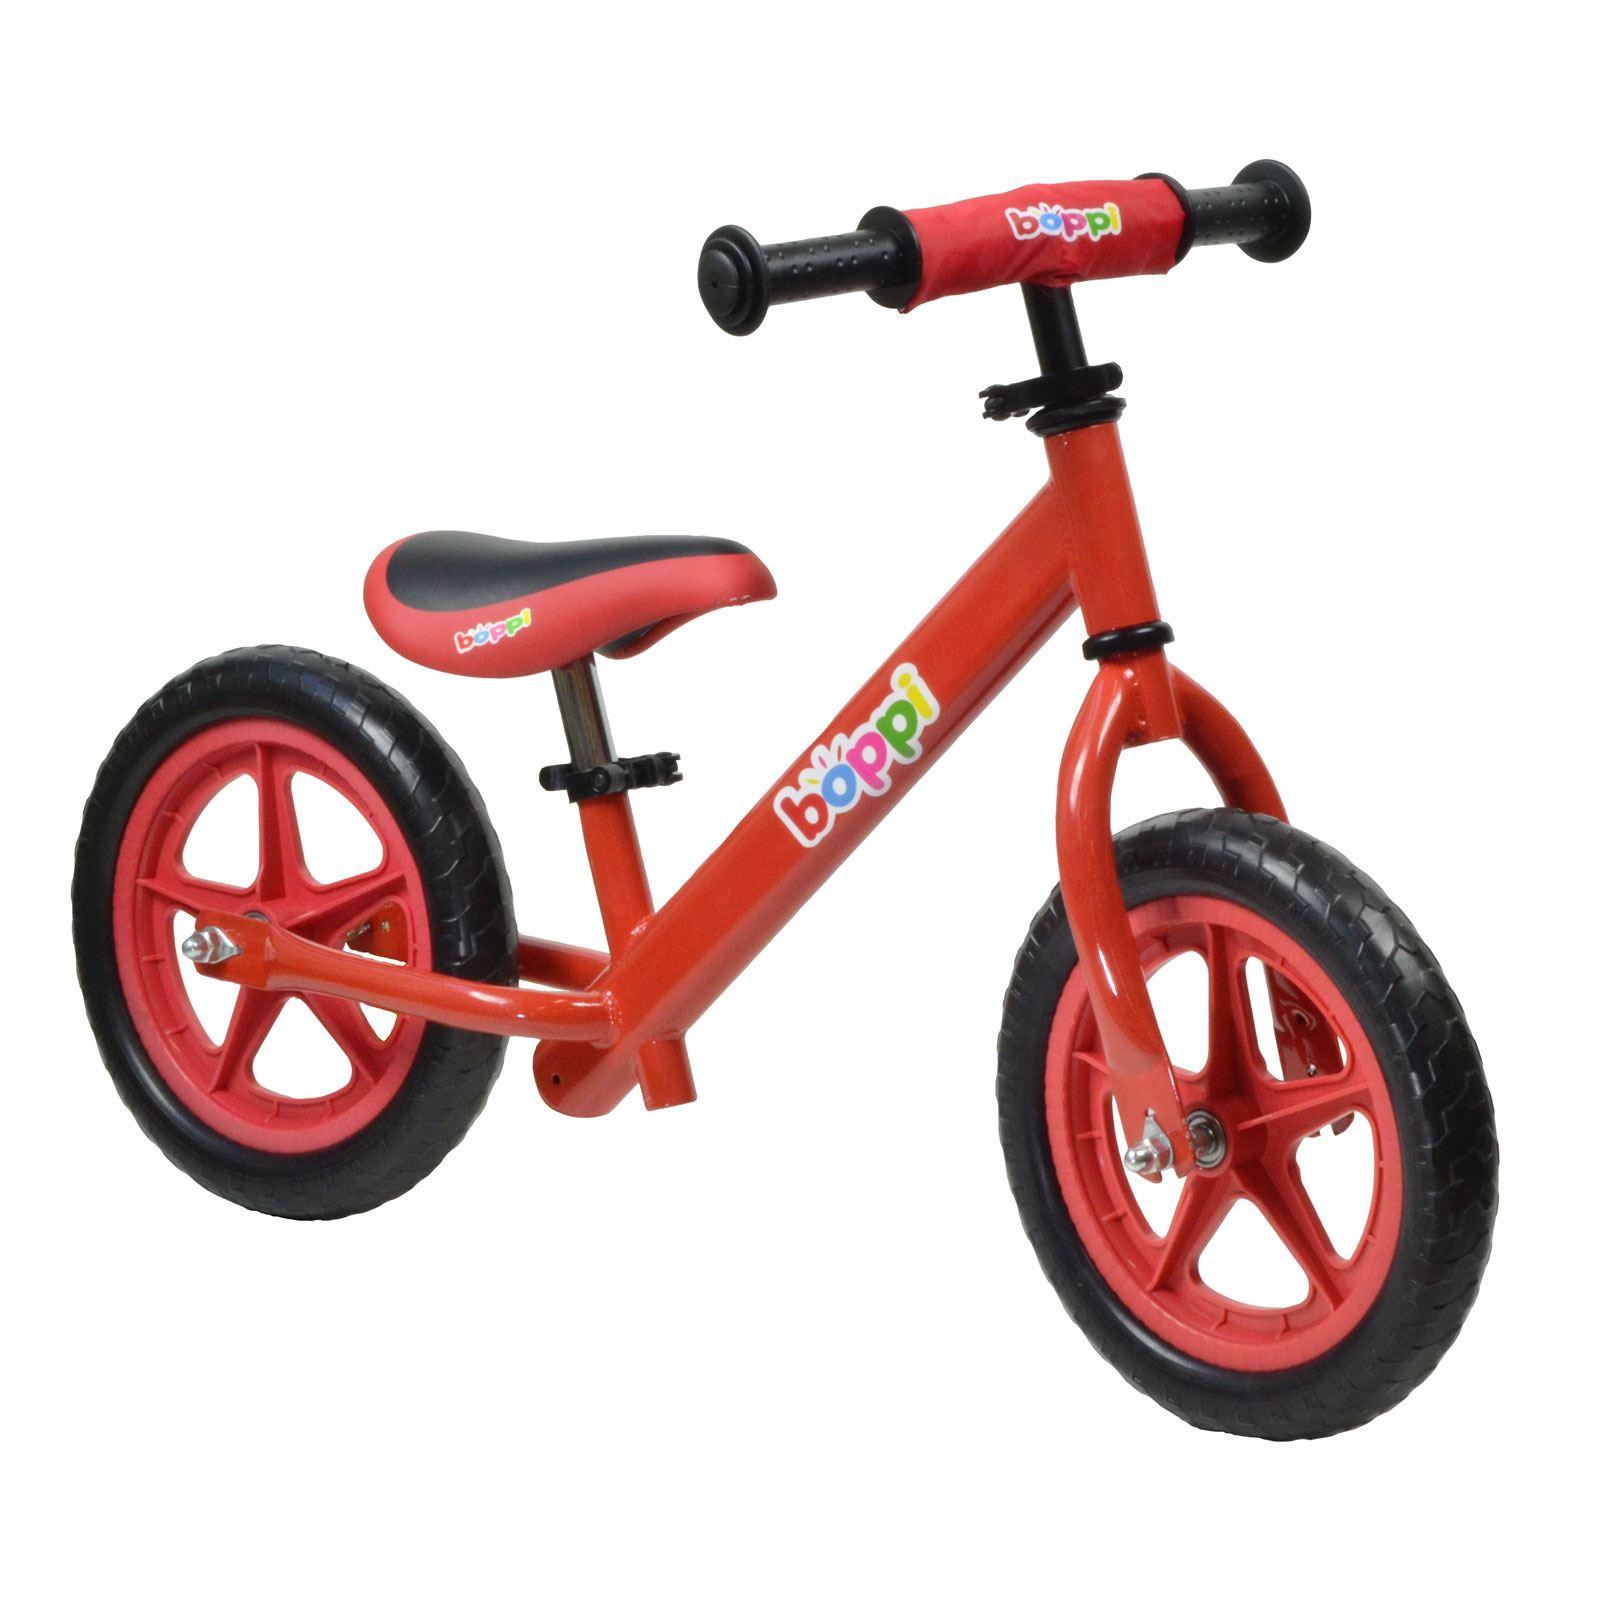 Boppi Childrens Kids Balance Bike Metal Boys Girls Kids Running